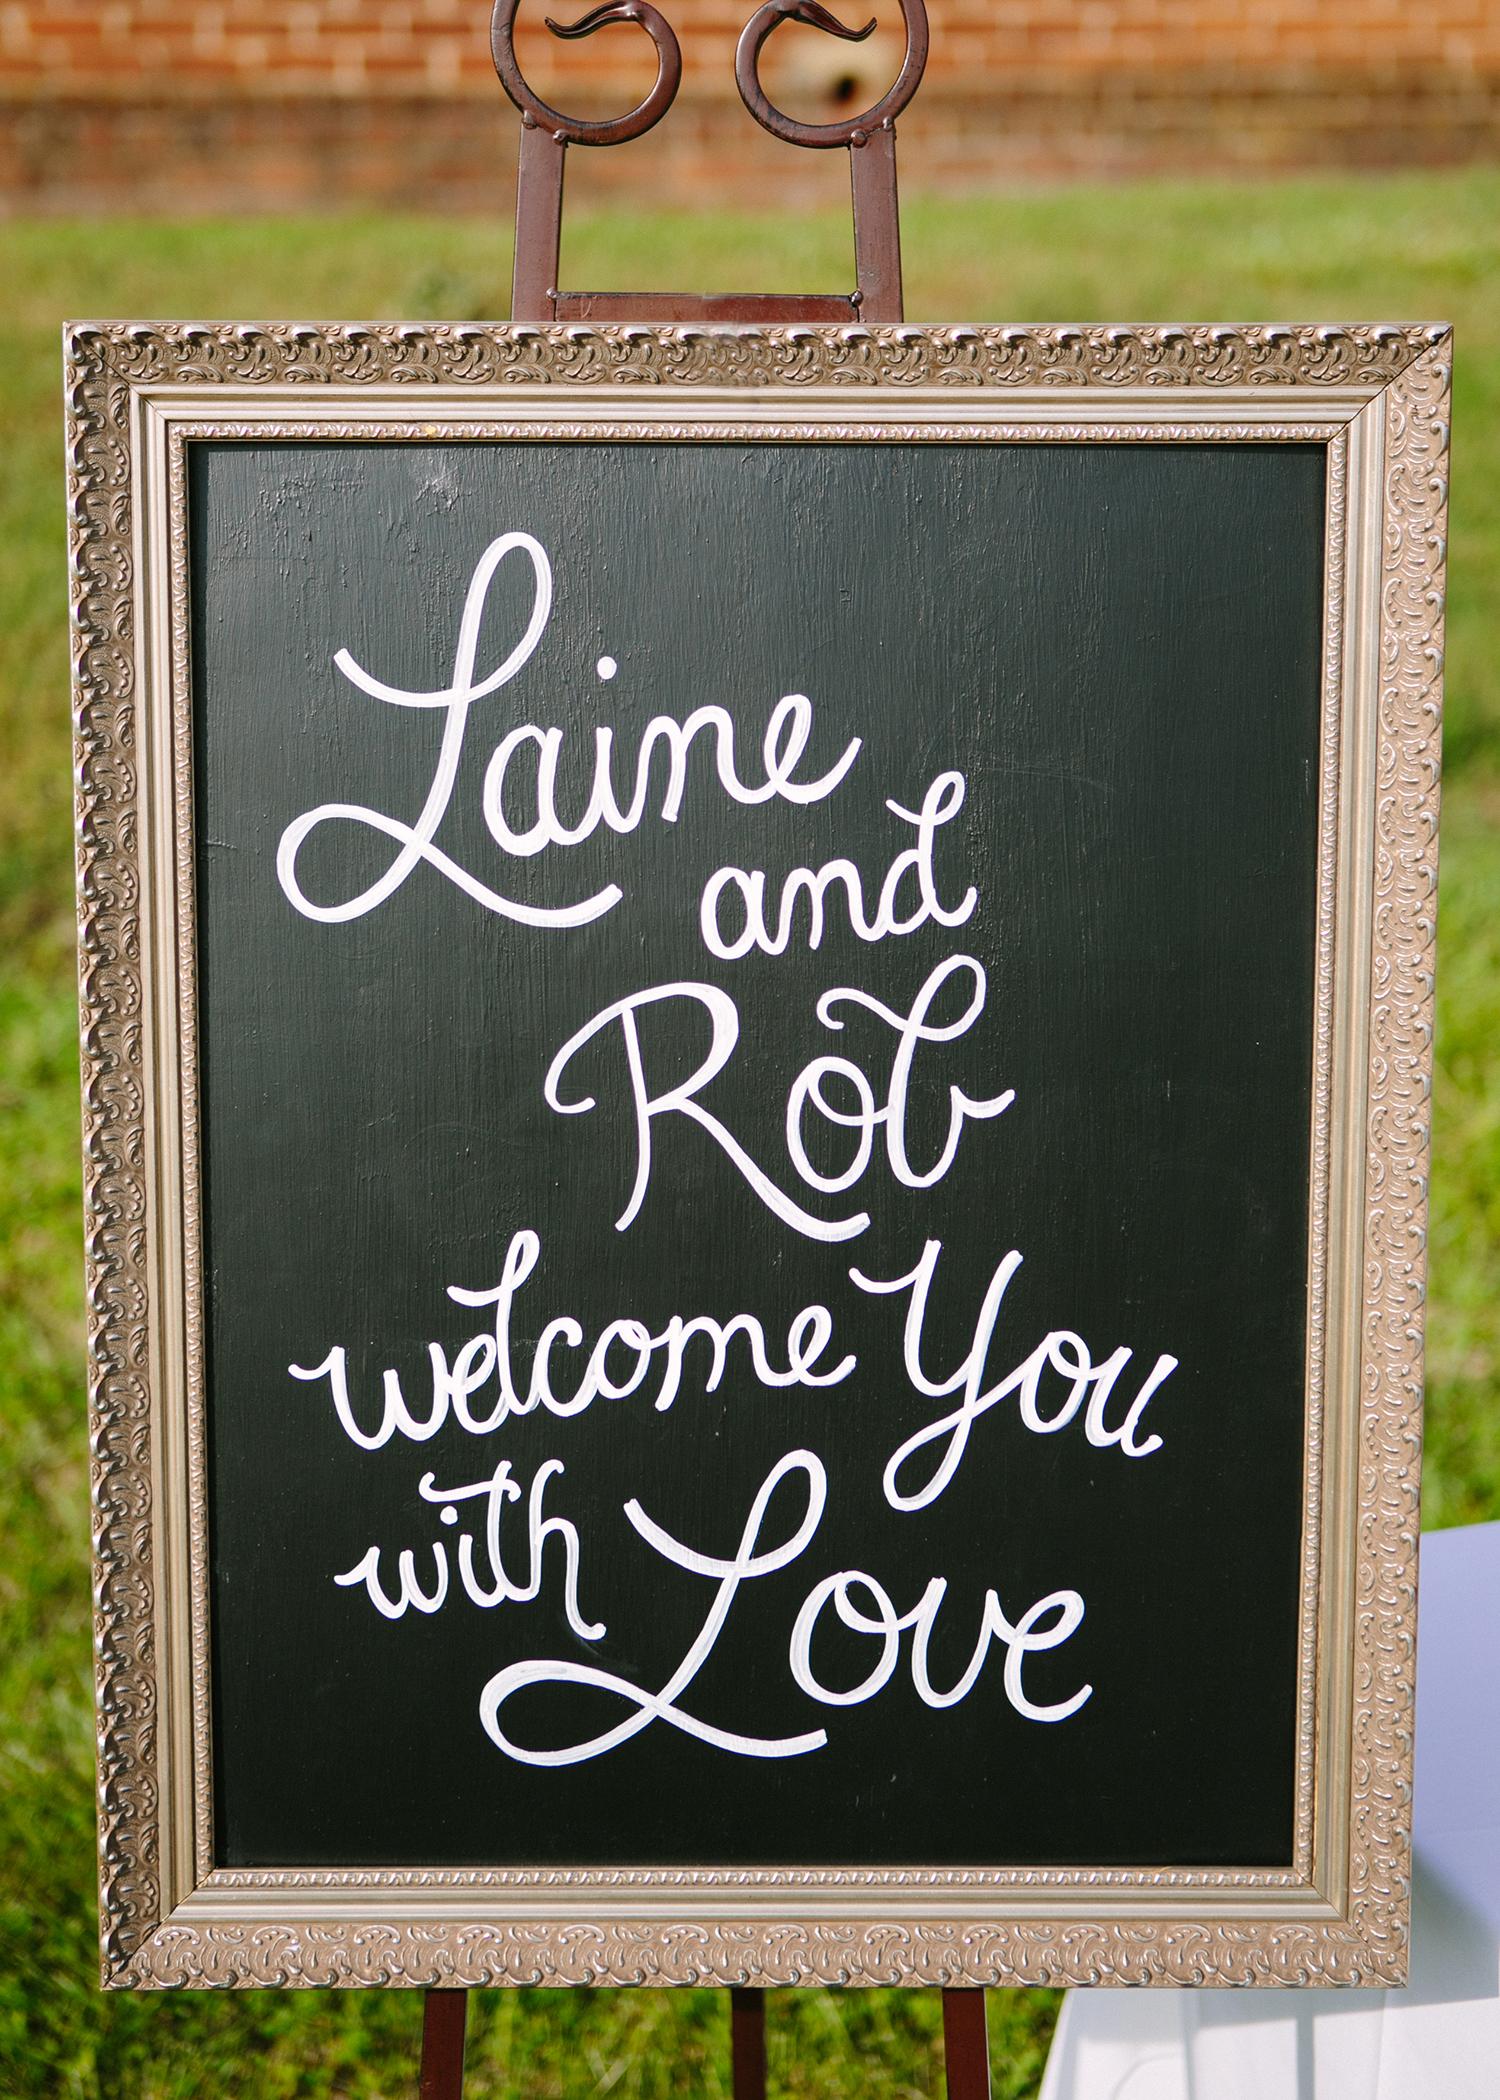 laine-rob-rw1112-25.jpg